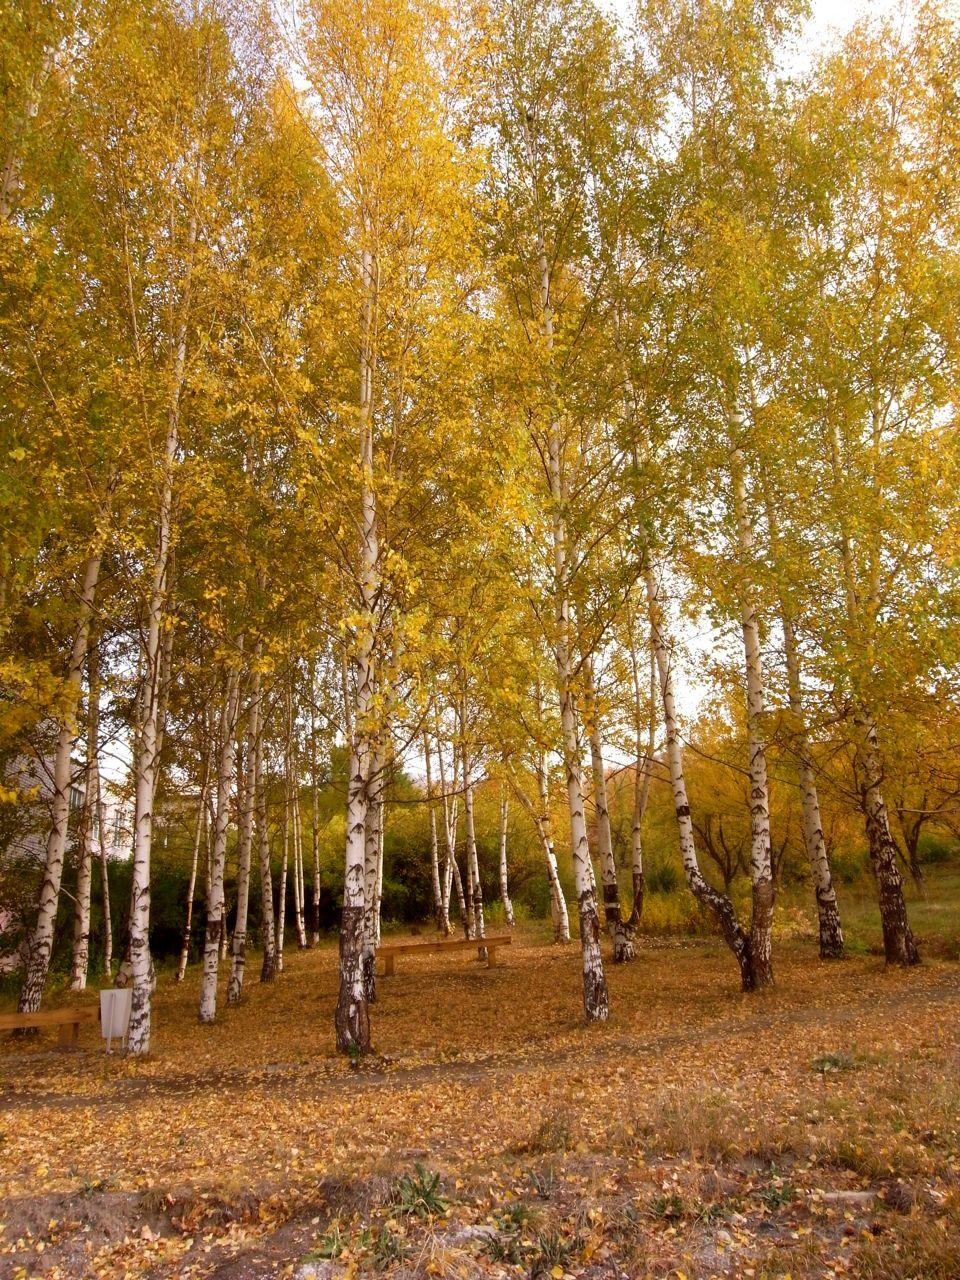 Tekeli in seasons 12 深まりゆく中央アジアの秋